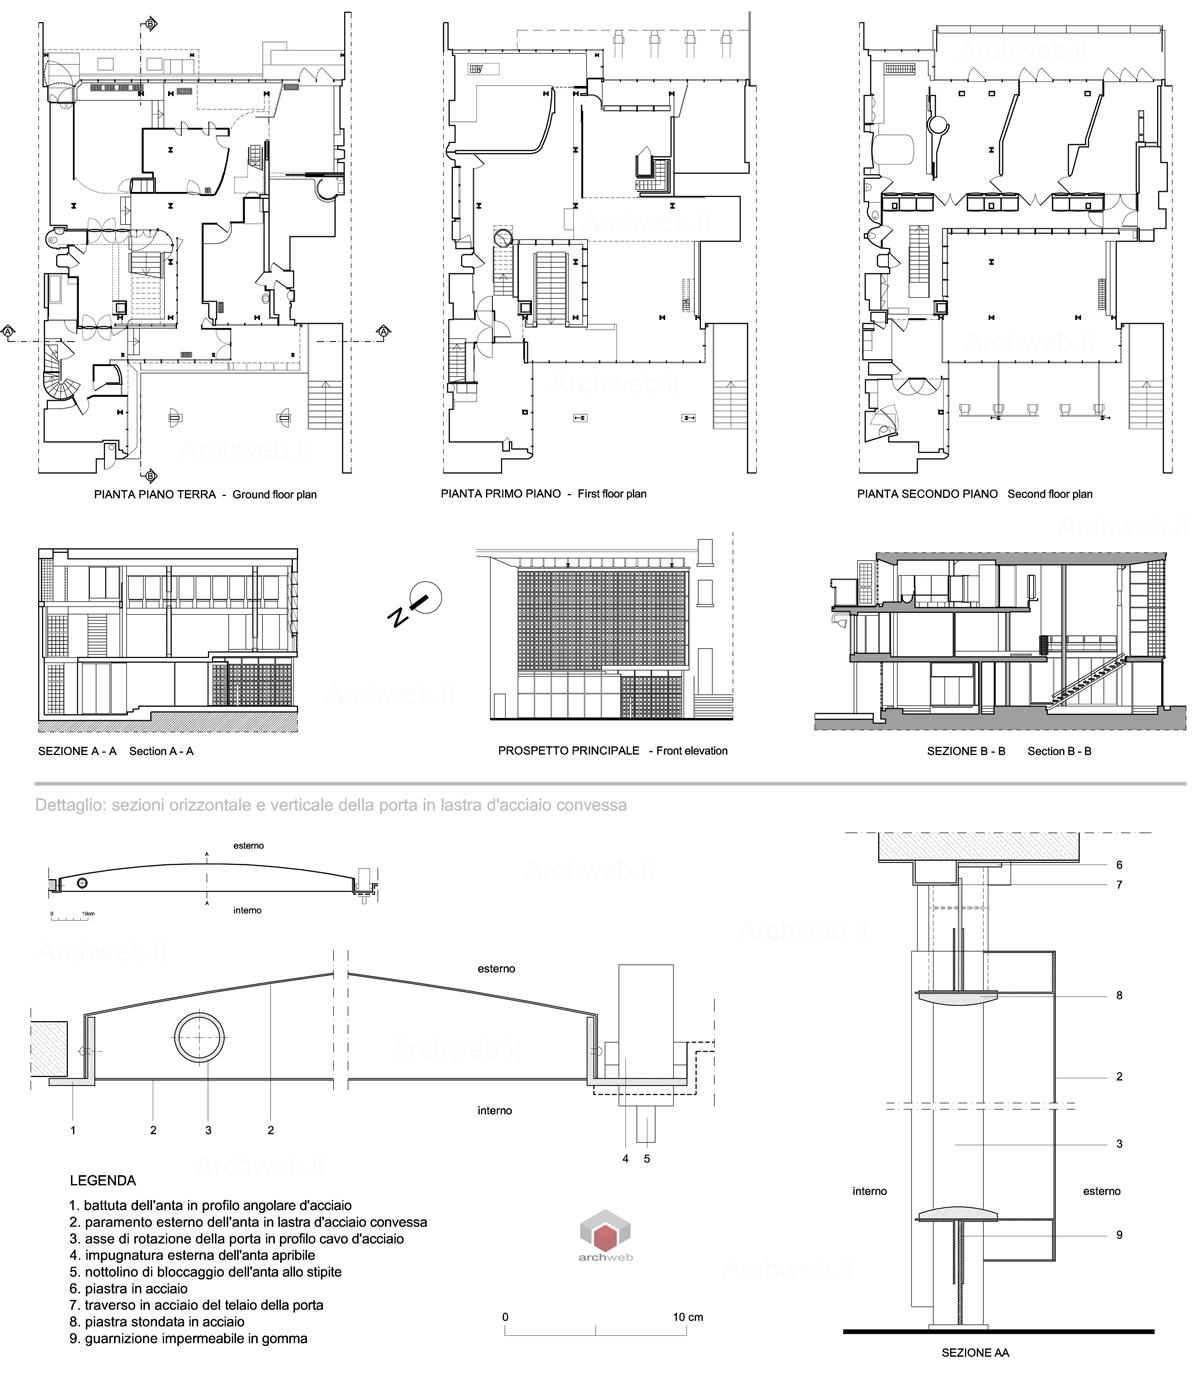 maison de verre dwg drawings. Black Bedroom Furniture Sets. Home Design Ideas